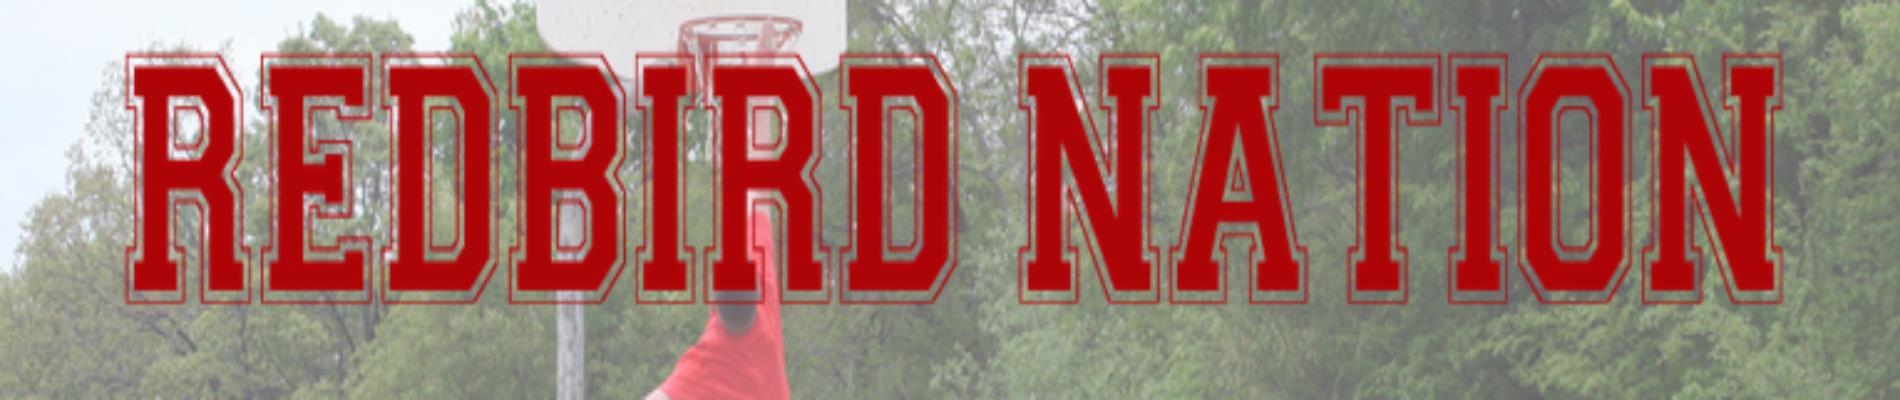 Redbird nation